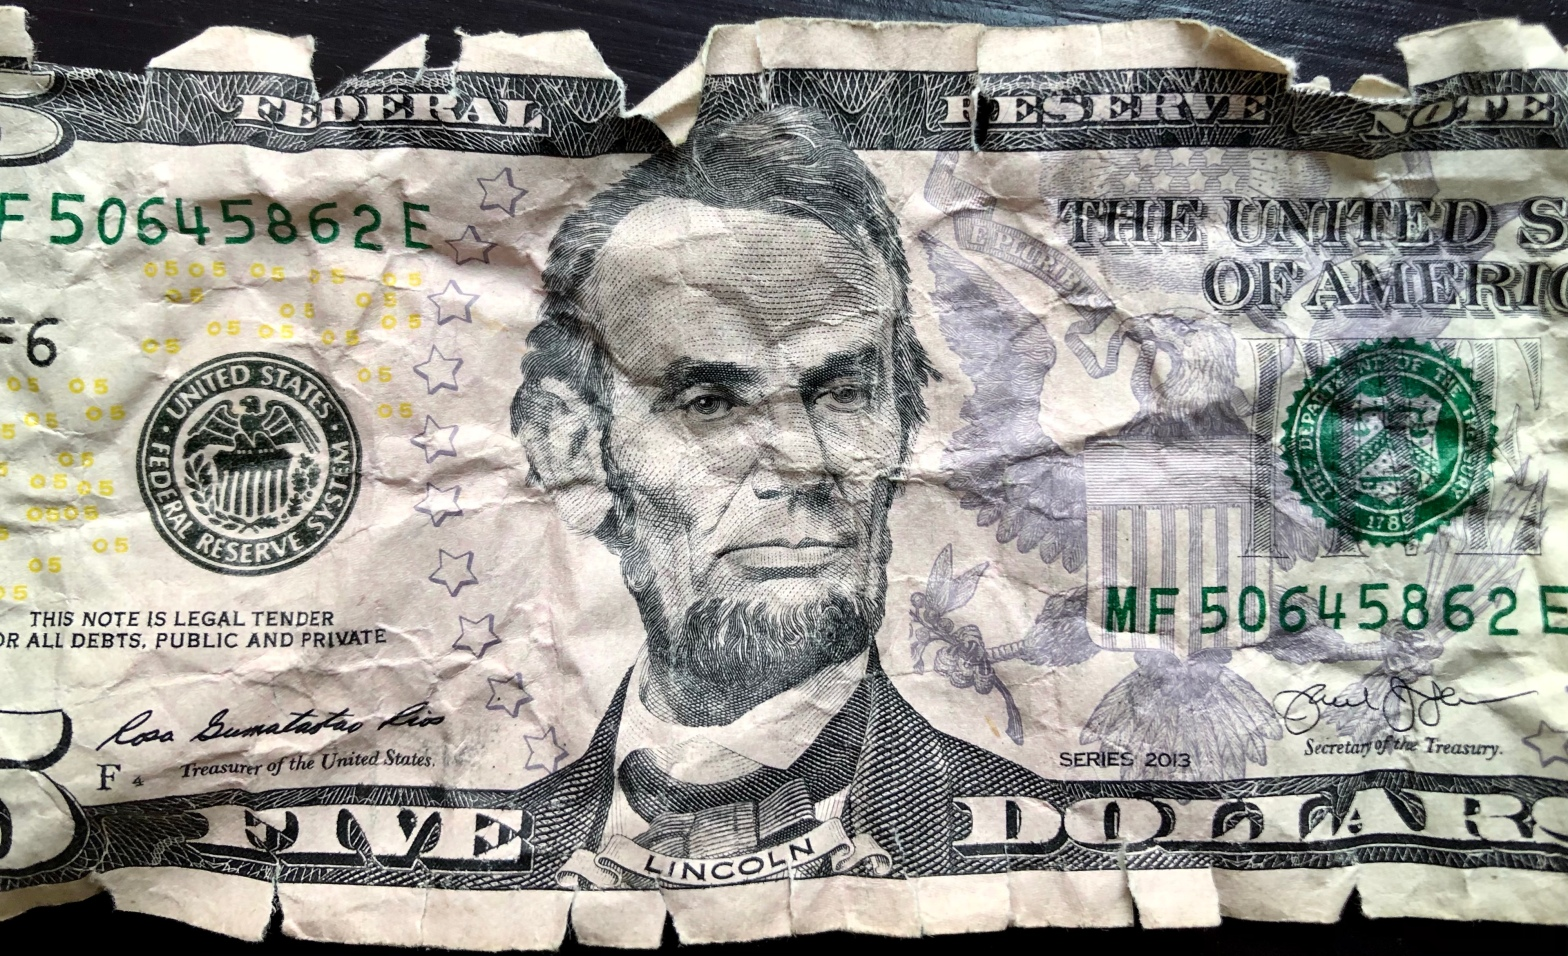 Ragged five dollar bill